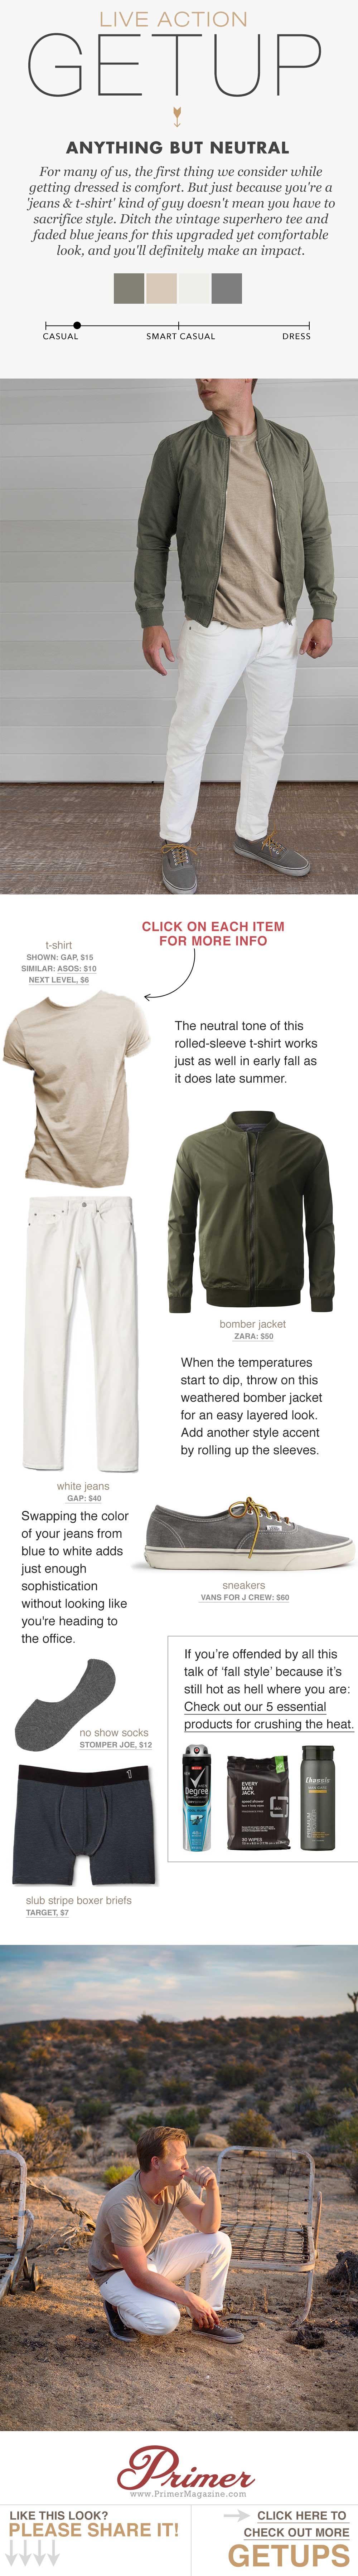 mens fashion inspiration white jeans tan tshirt green bomber jacket